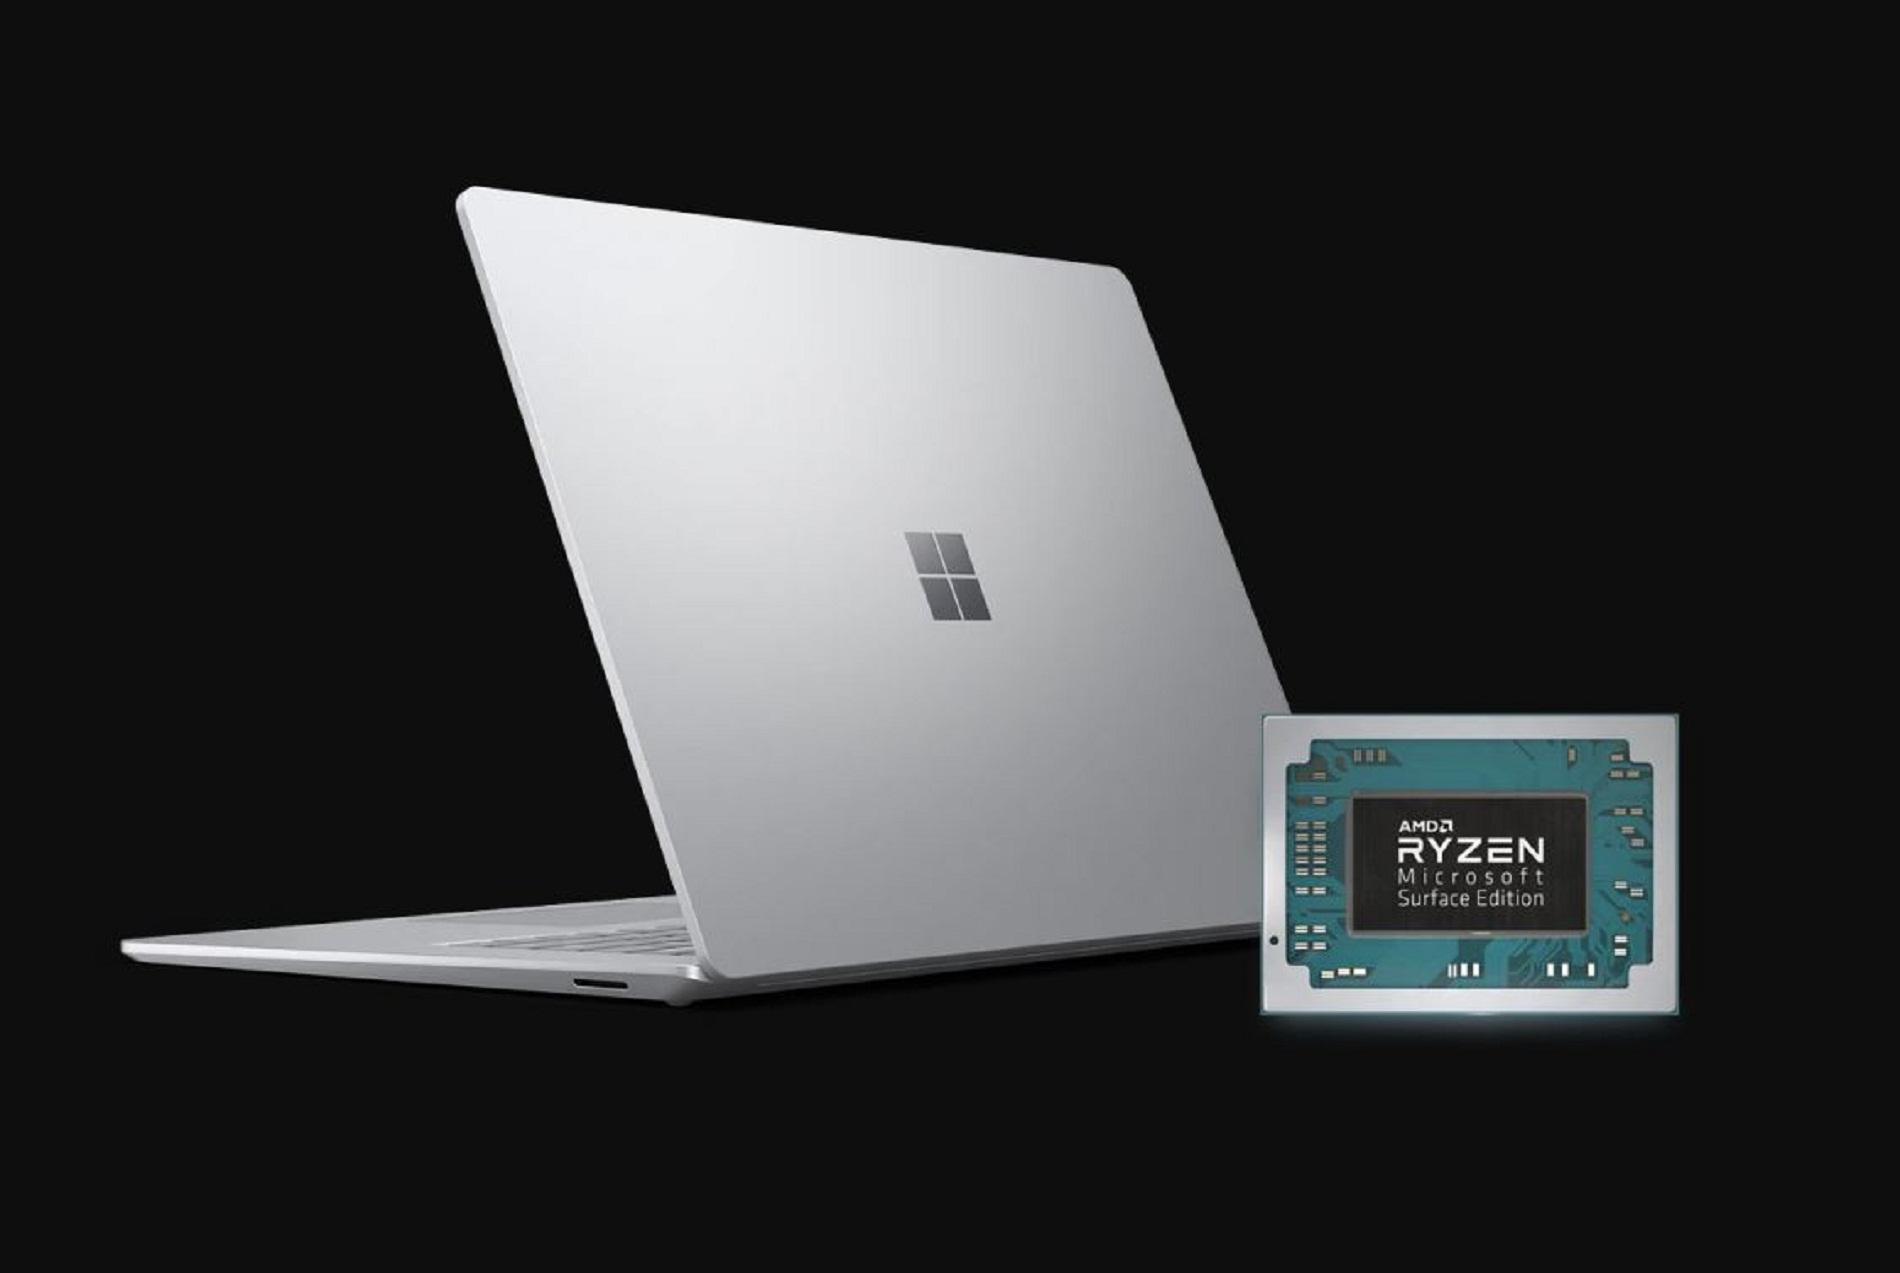 New Microsoft Surface Notebook Identified Using AMD Ryzen Zen CPU And Navi (Radeon RX) GPU